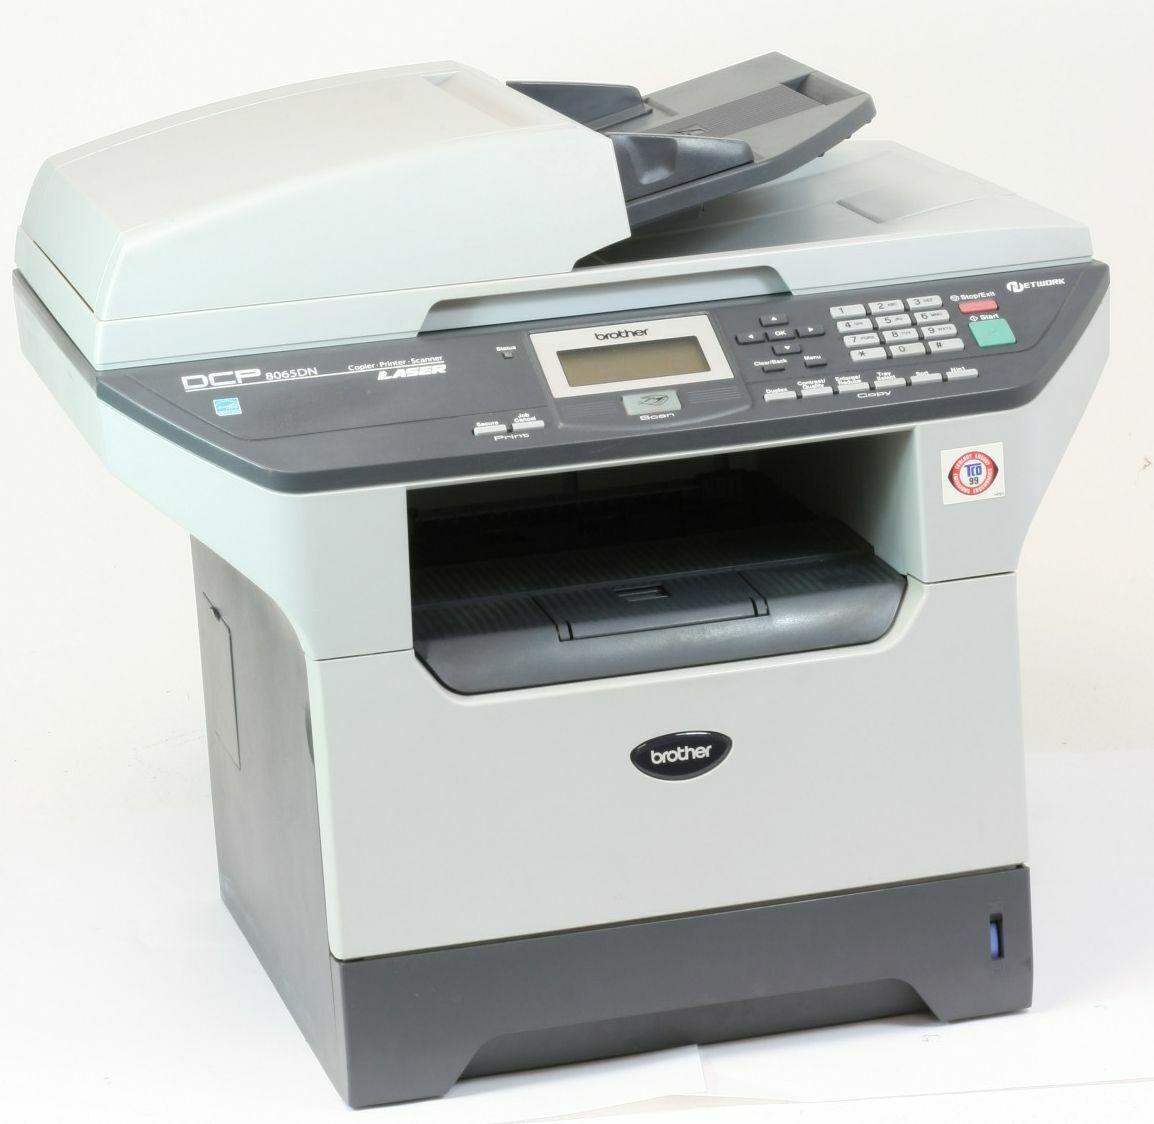 Brother dcp-8065dn imprimante laser imprimante scanner photocopieuse utilisé